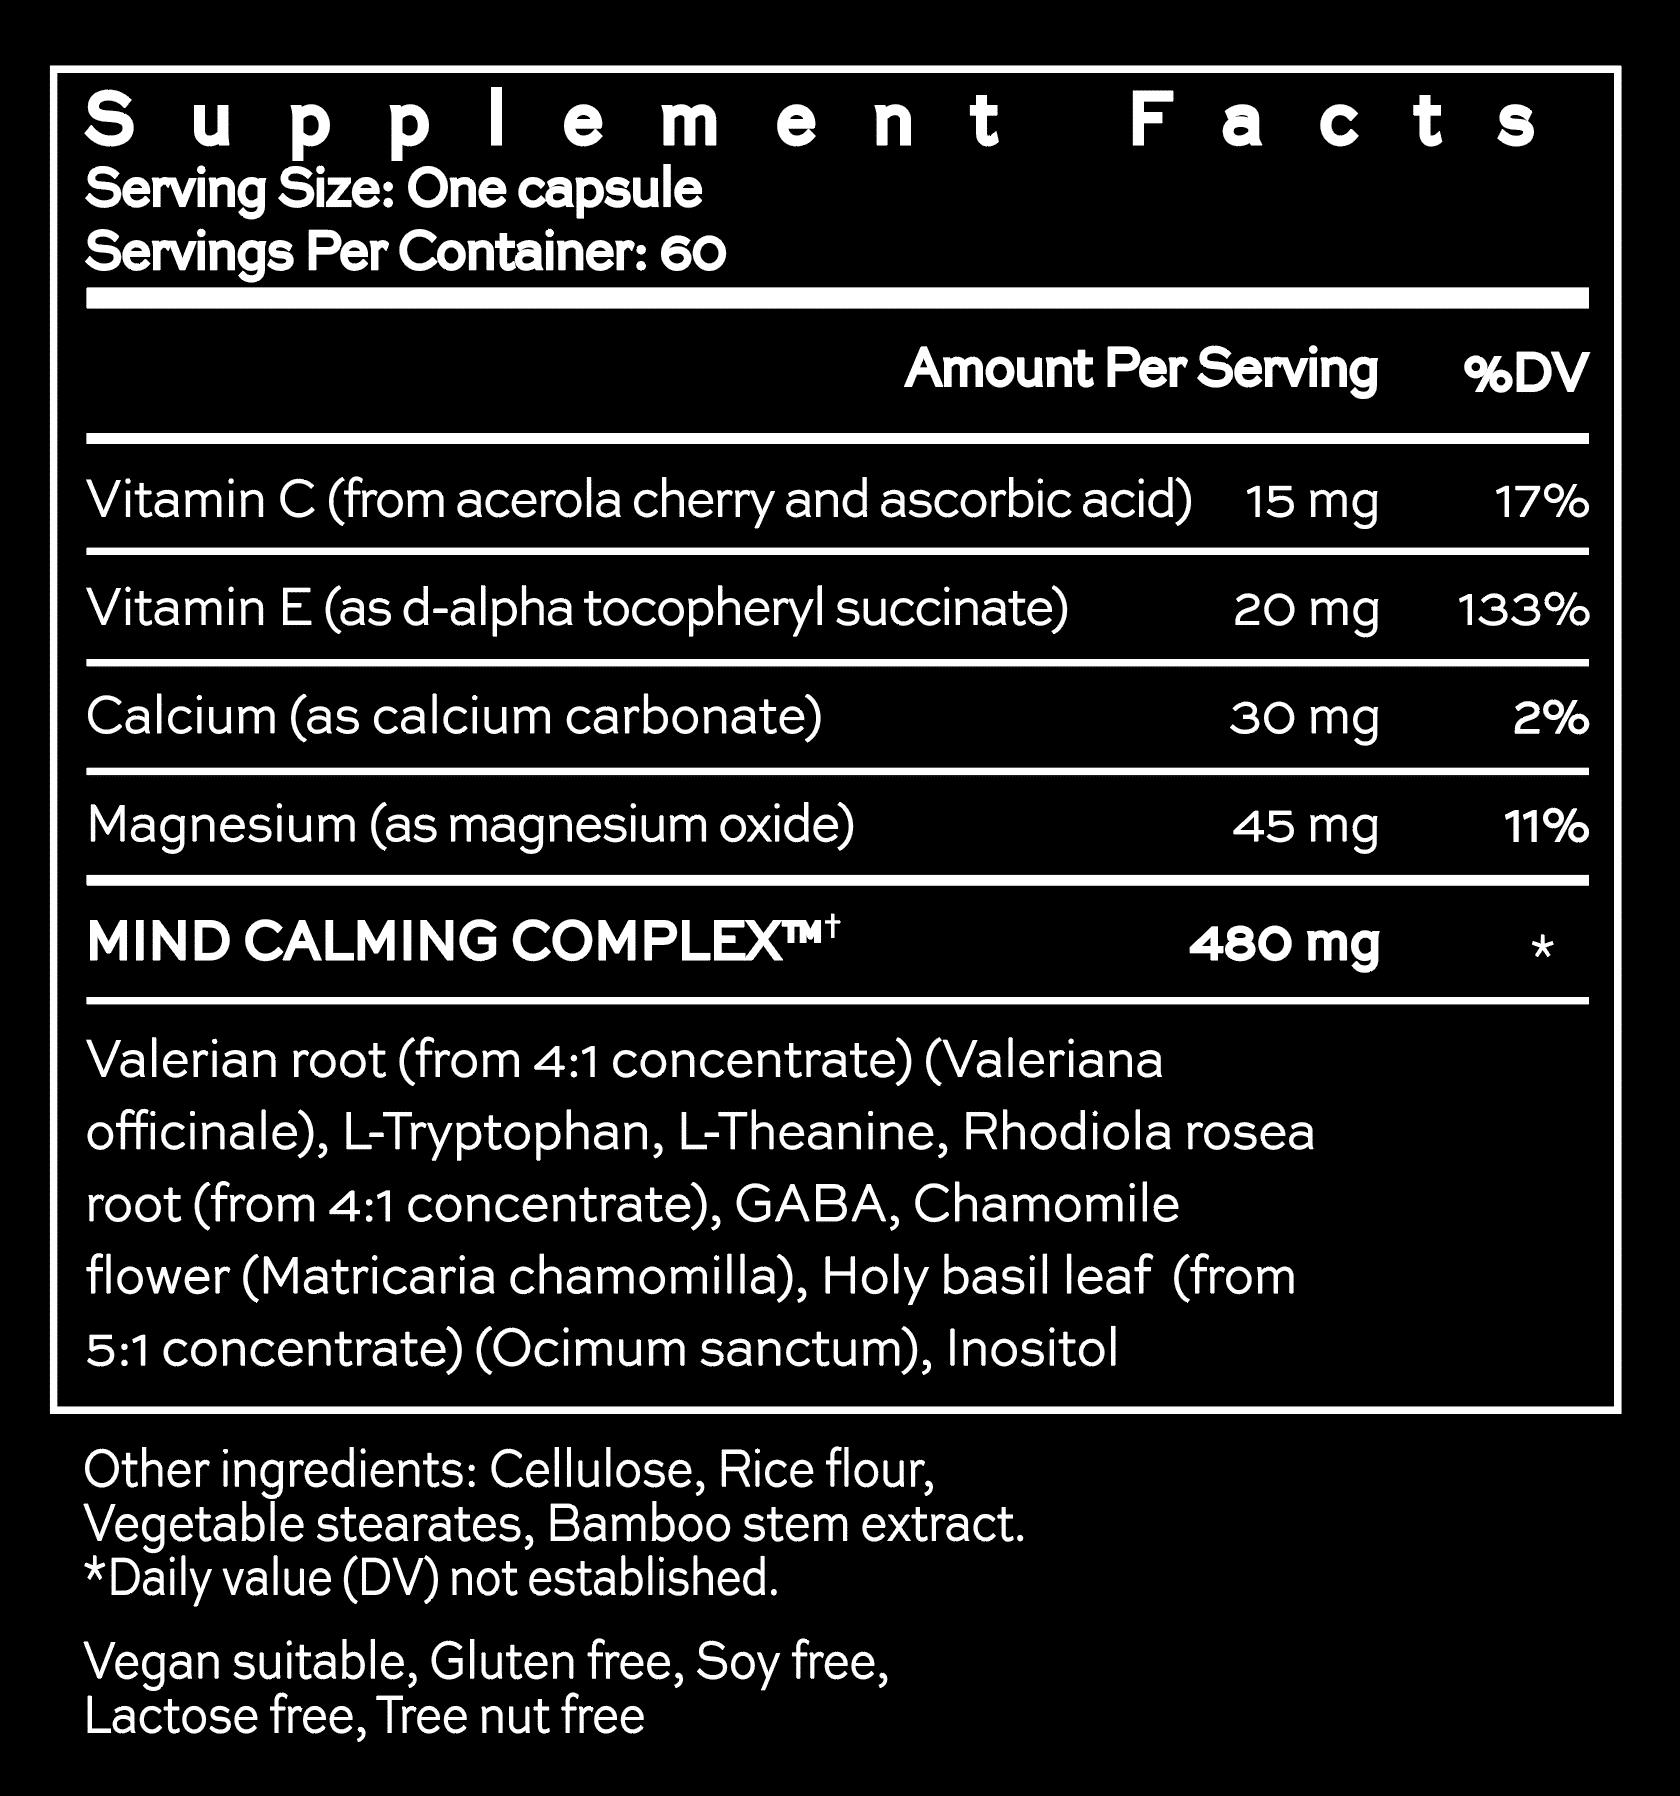 MindYourMind - Scientifically formulated sleep aid supplement - Hush & Hush